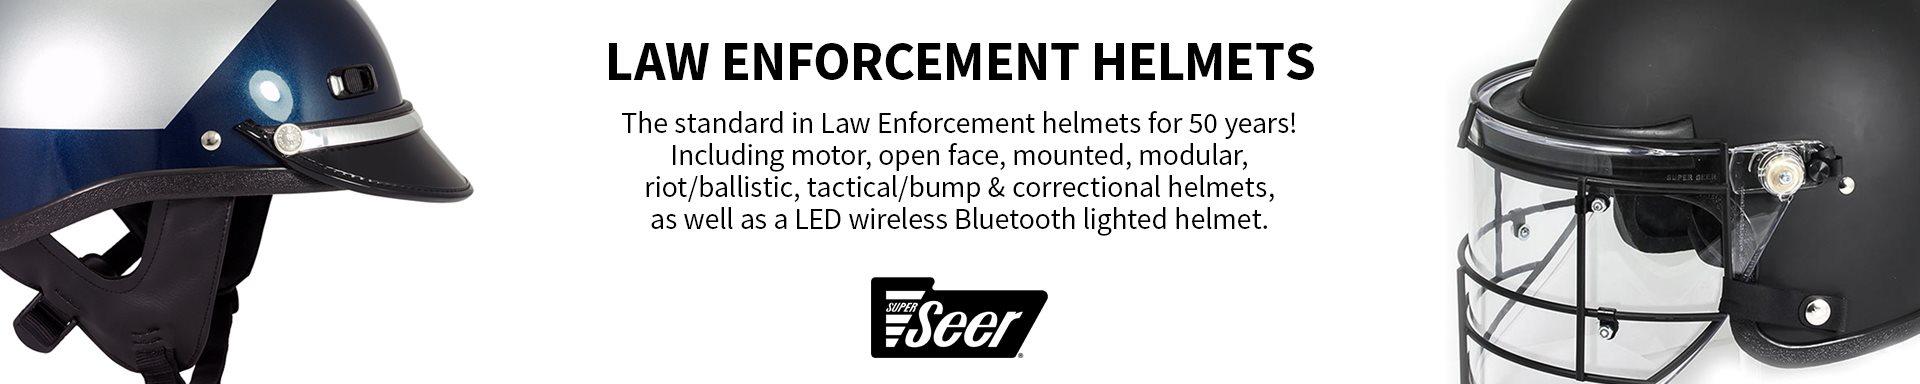 Super Seer - Law Enforcement Helmets